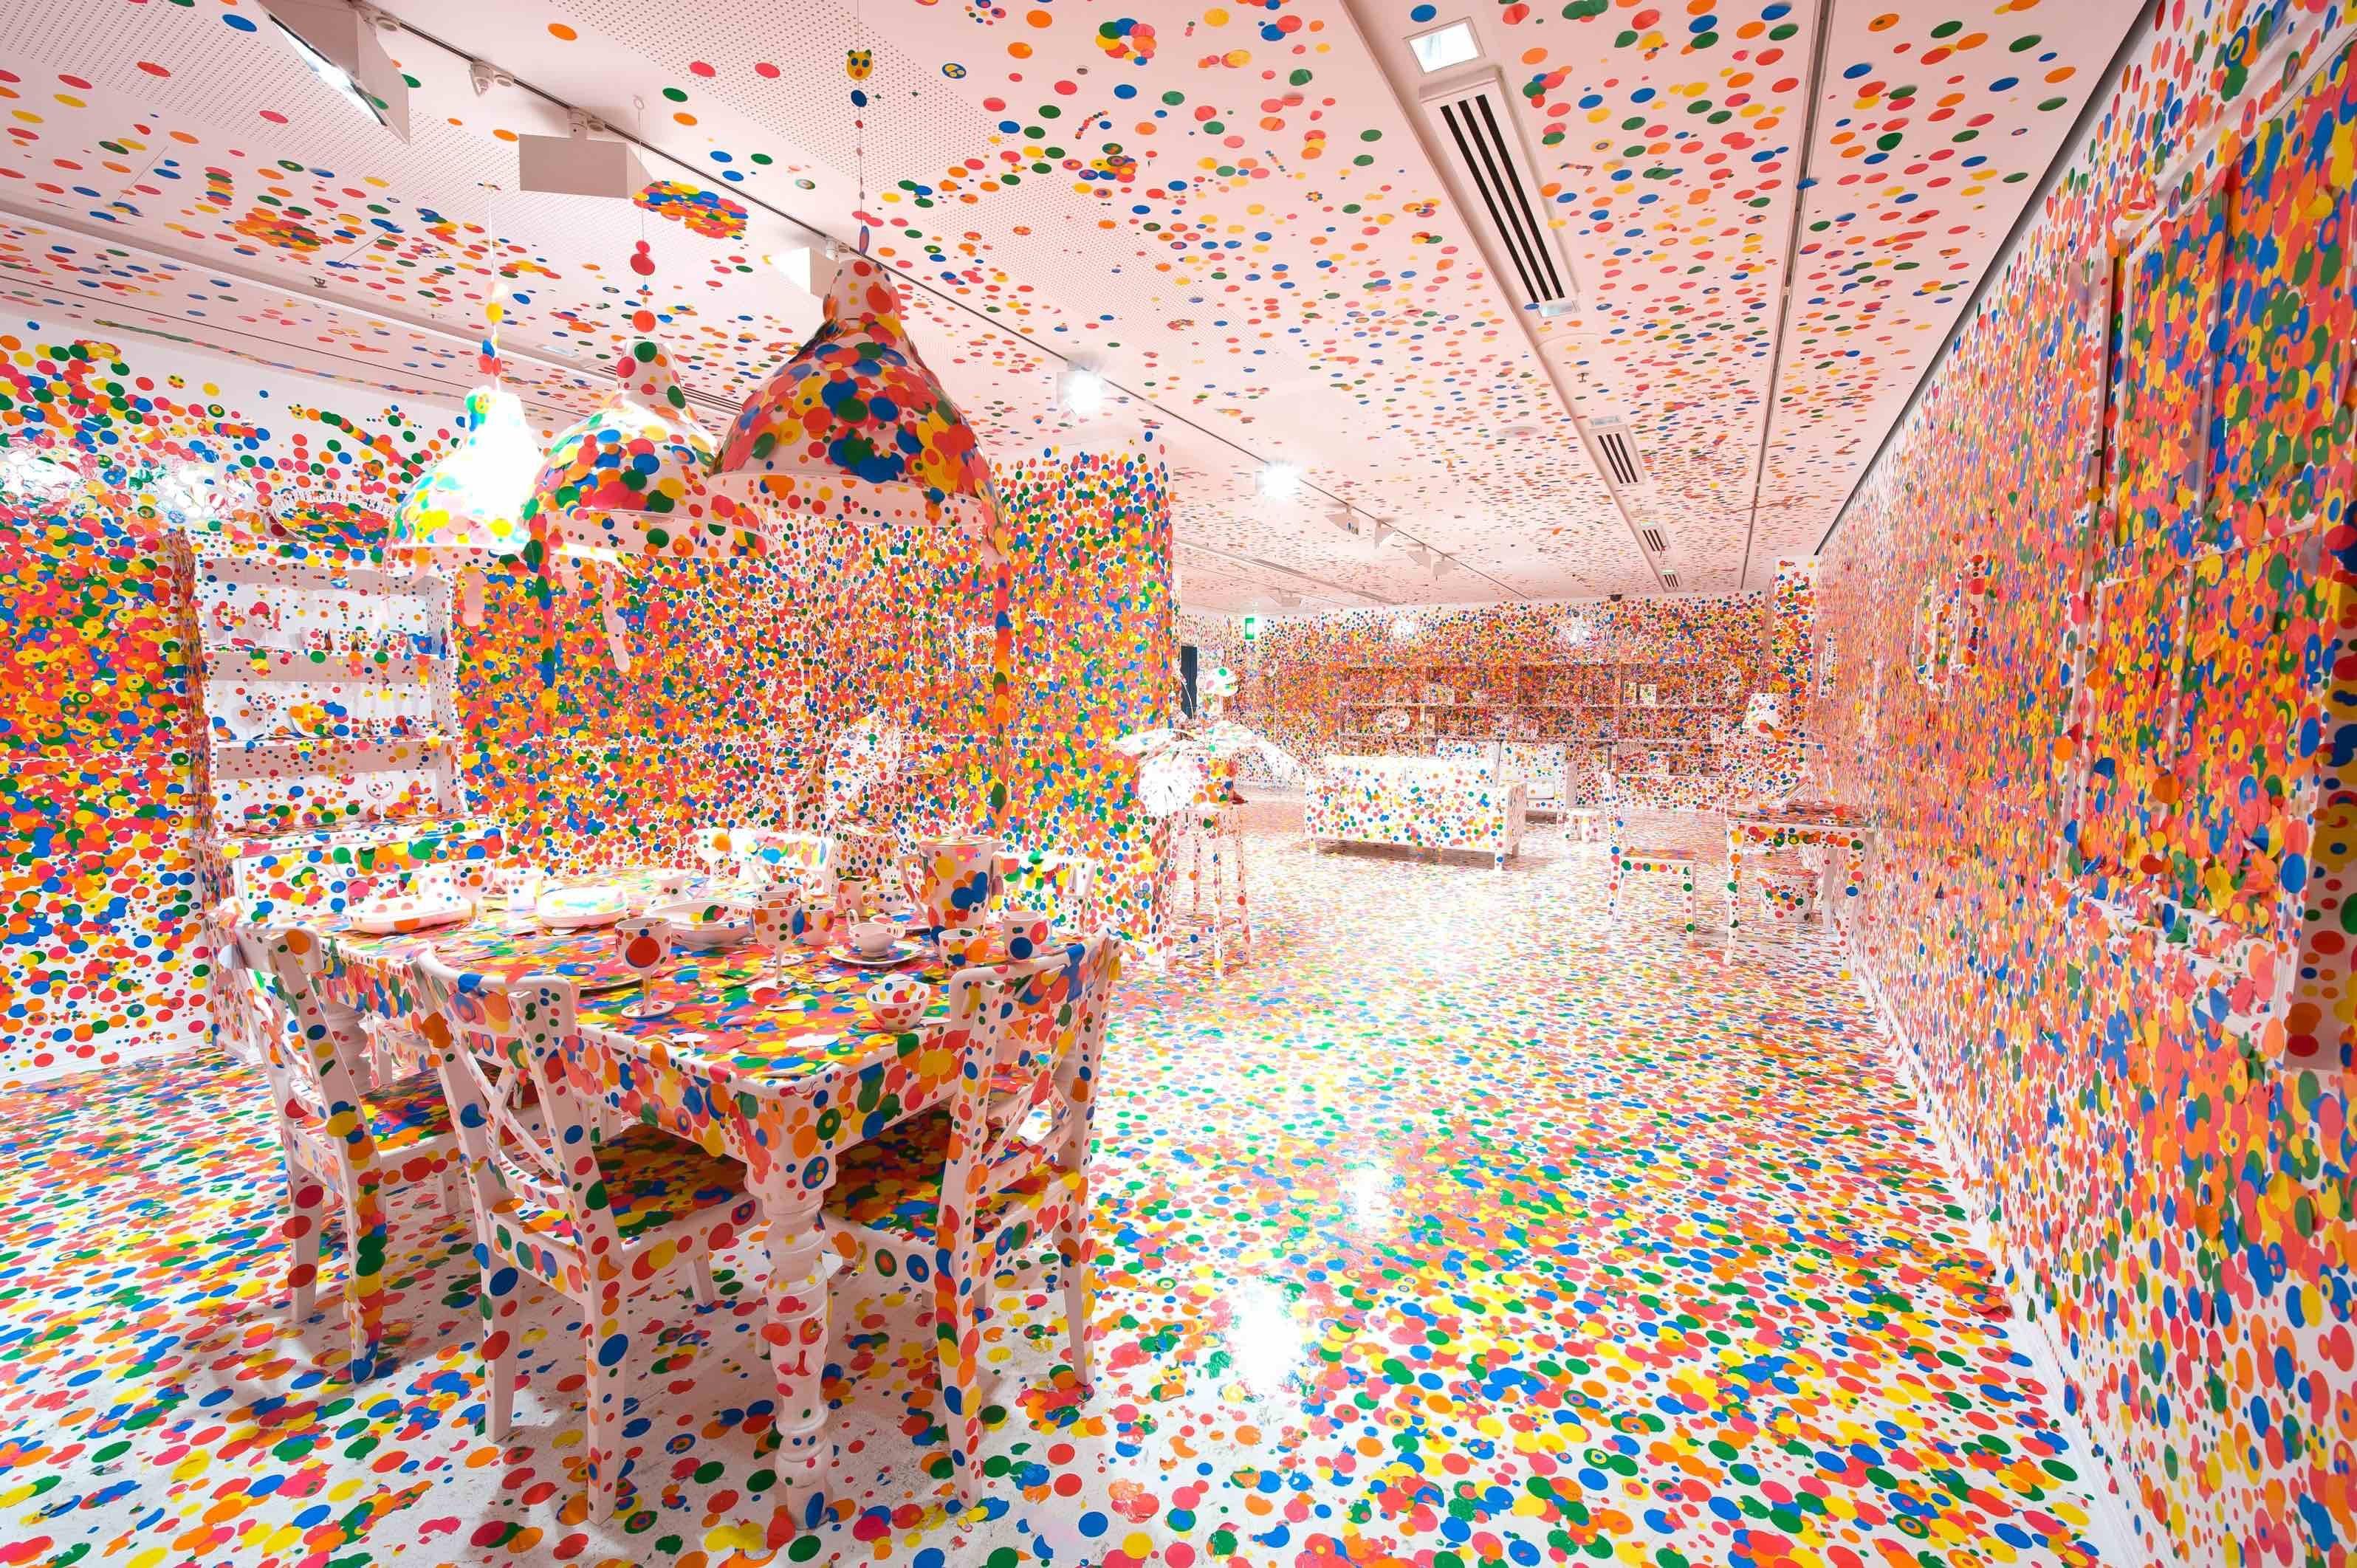 Yayoi Kusama, The Obliteration Room, 2002 to present   © Yayoi Kusama/Queensland Art Gallery, Brisbane, Australia. Photograph: QAGOMA Photography.